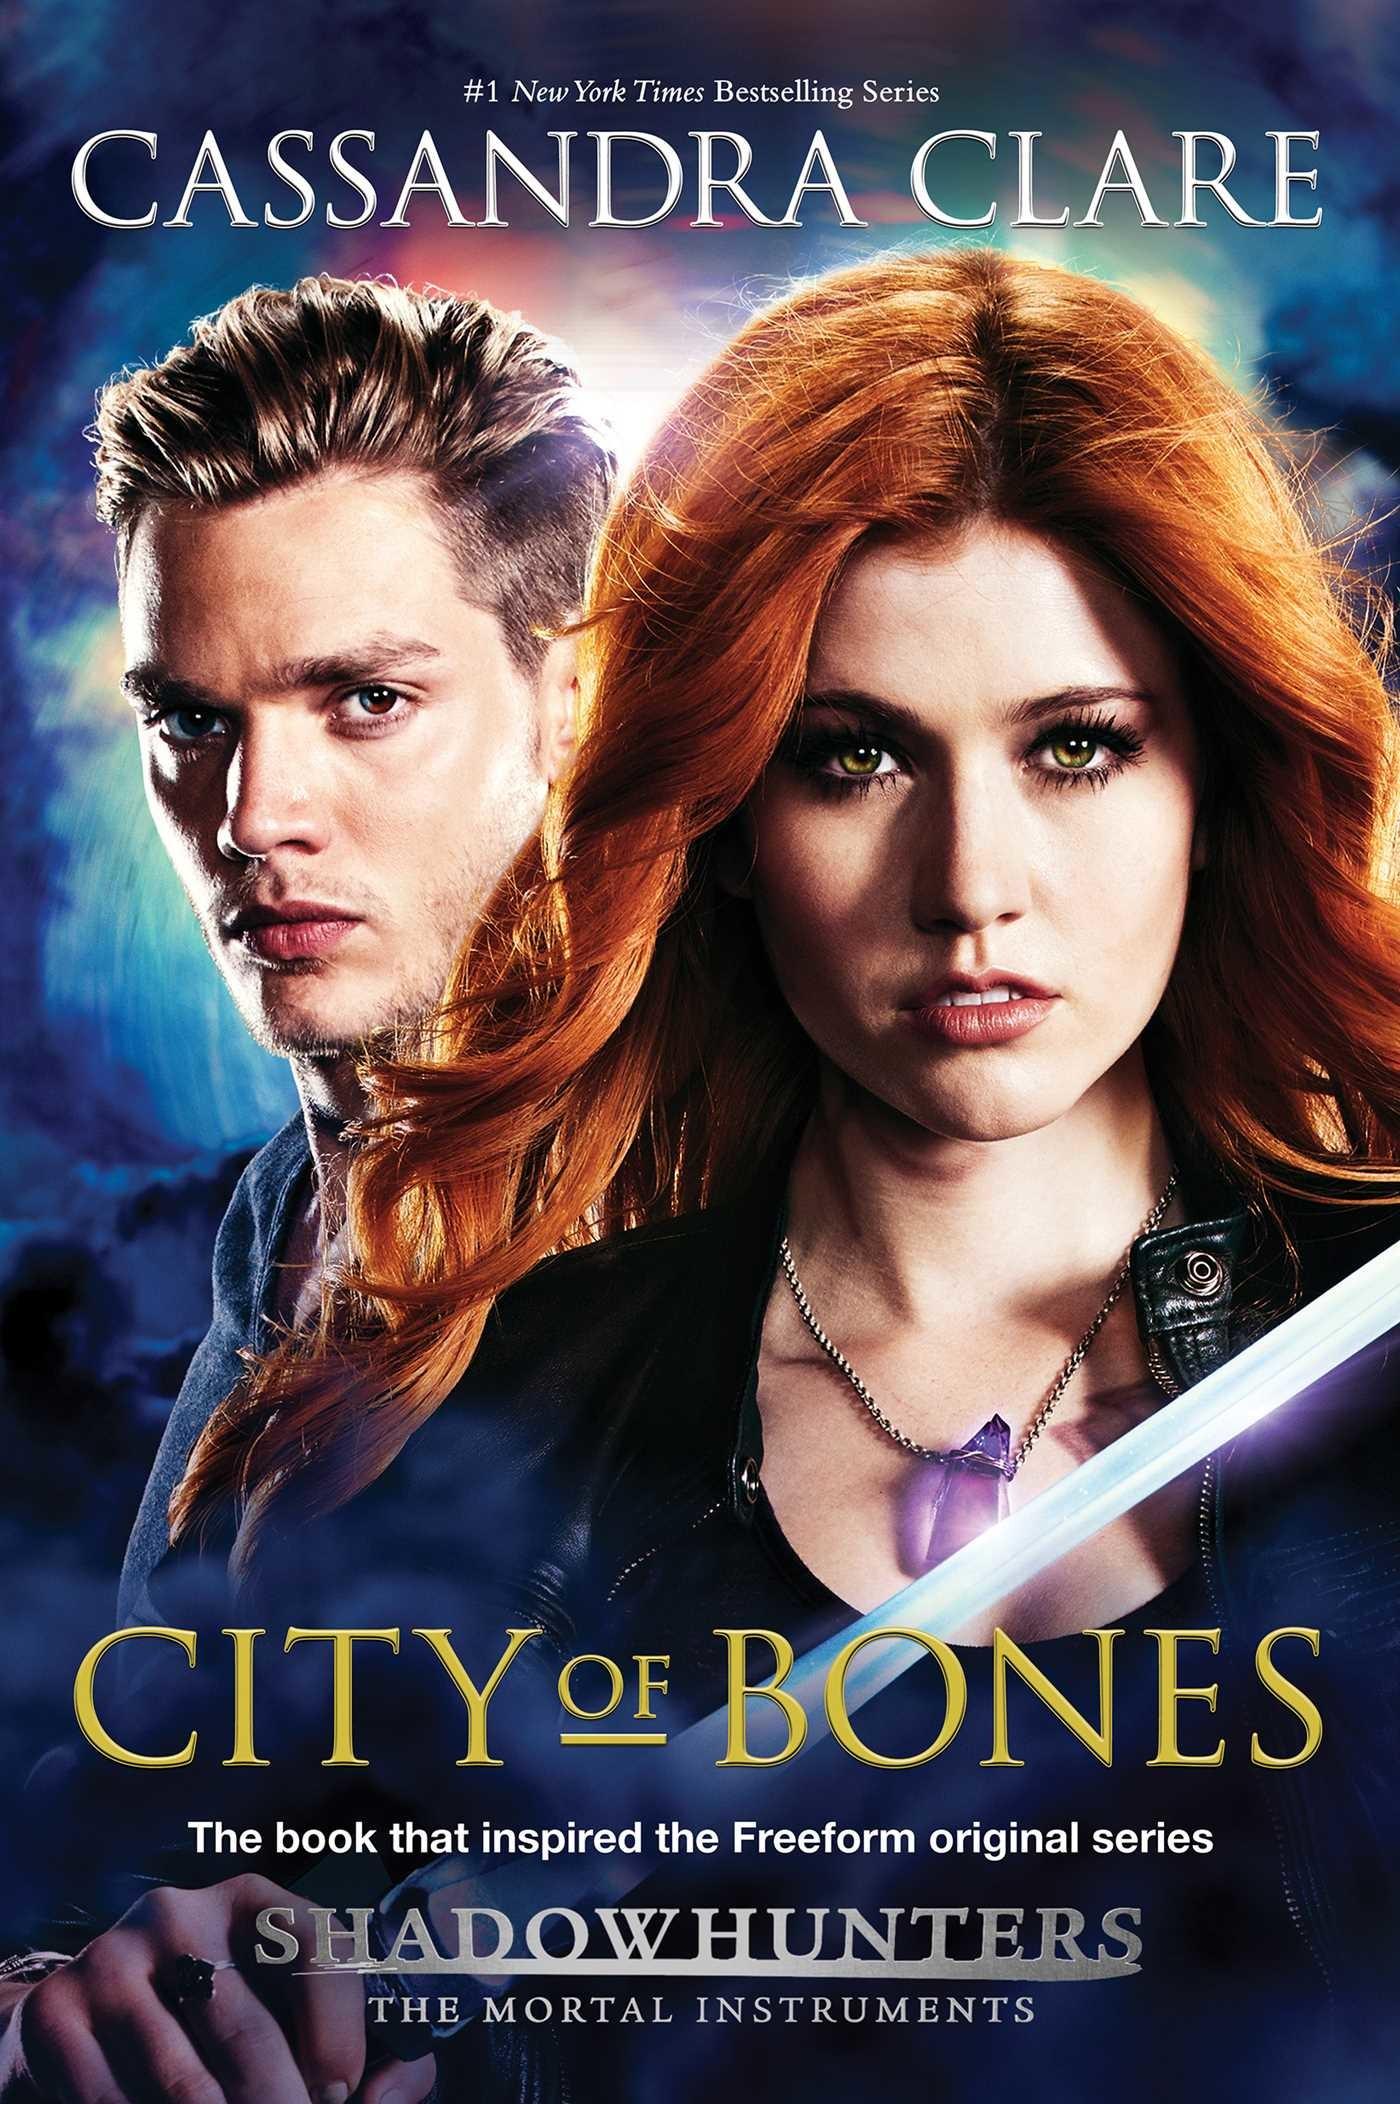 City of bones 9781481470308 hr